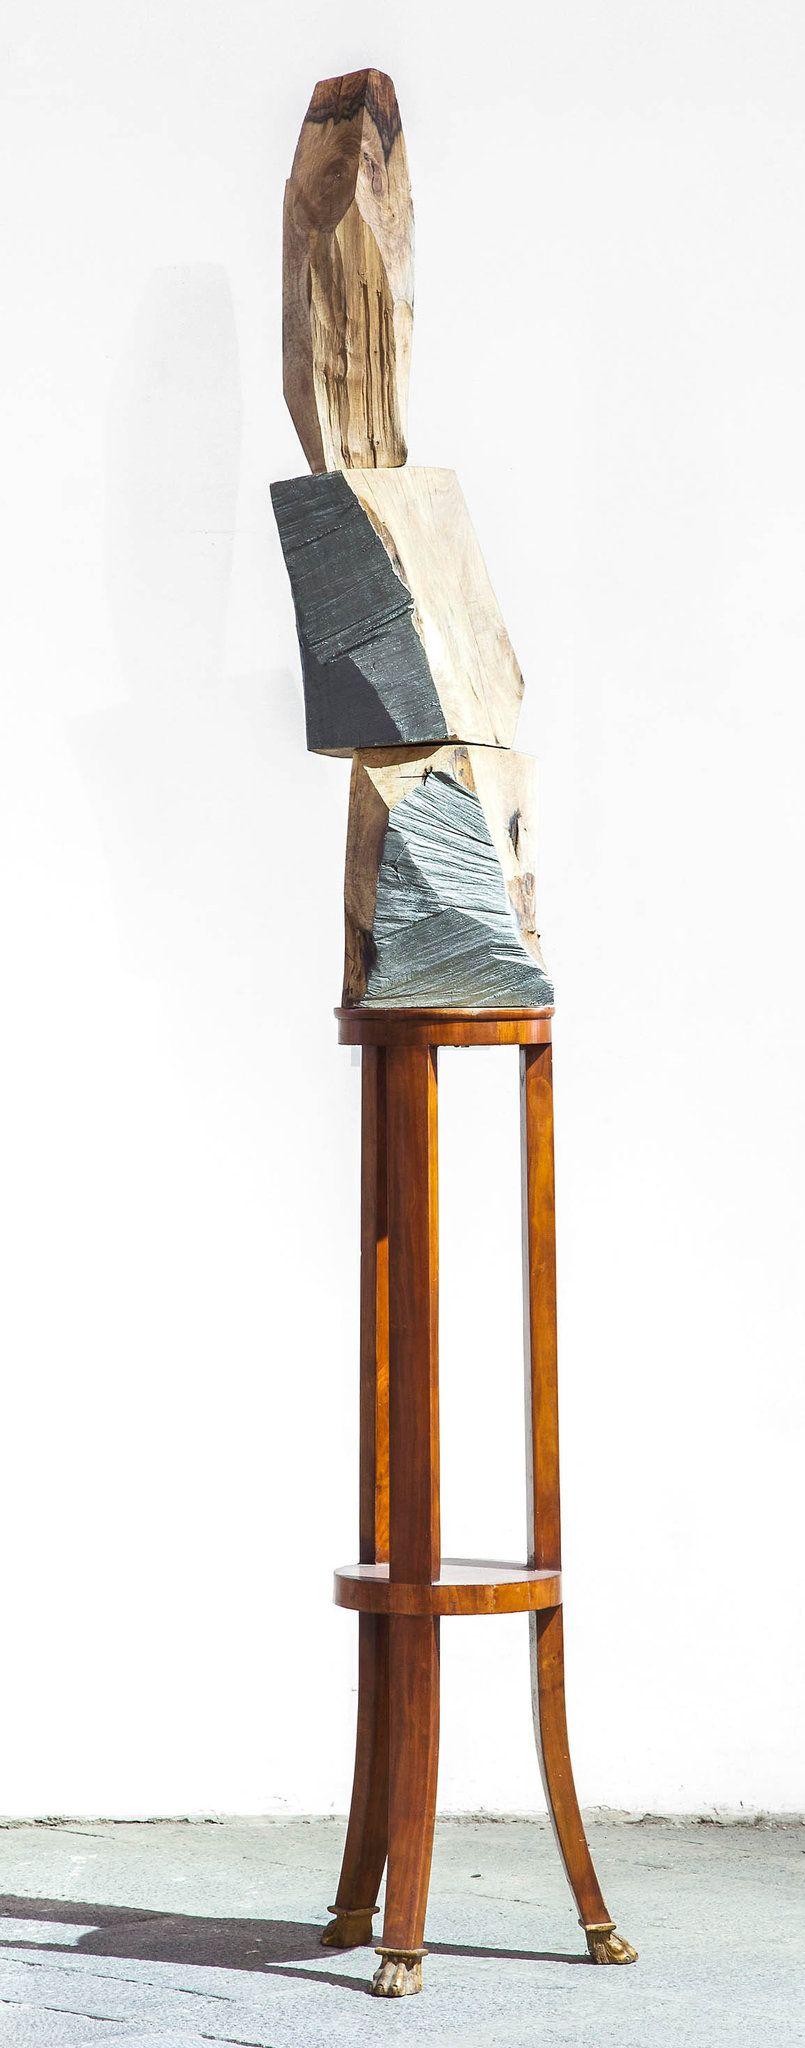 Jimmie Durham. Forest and Brancusi, 2012.